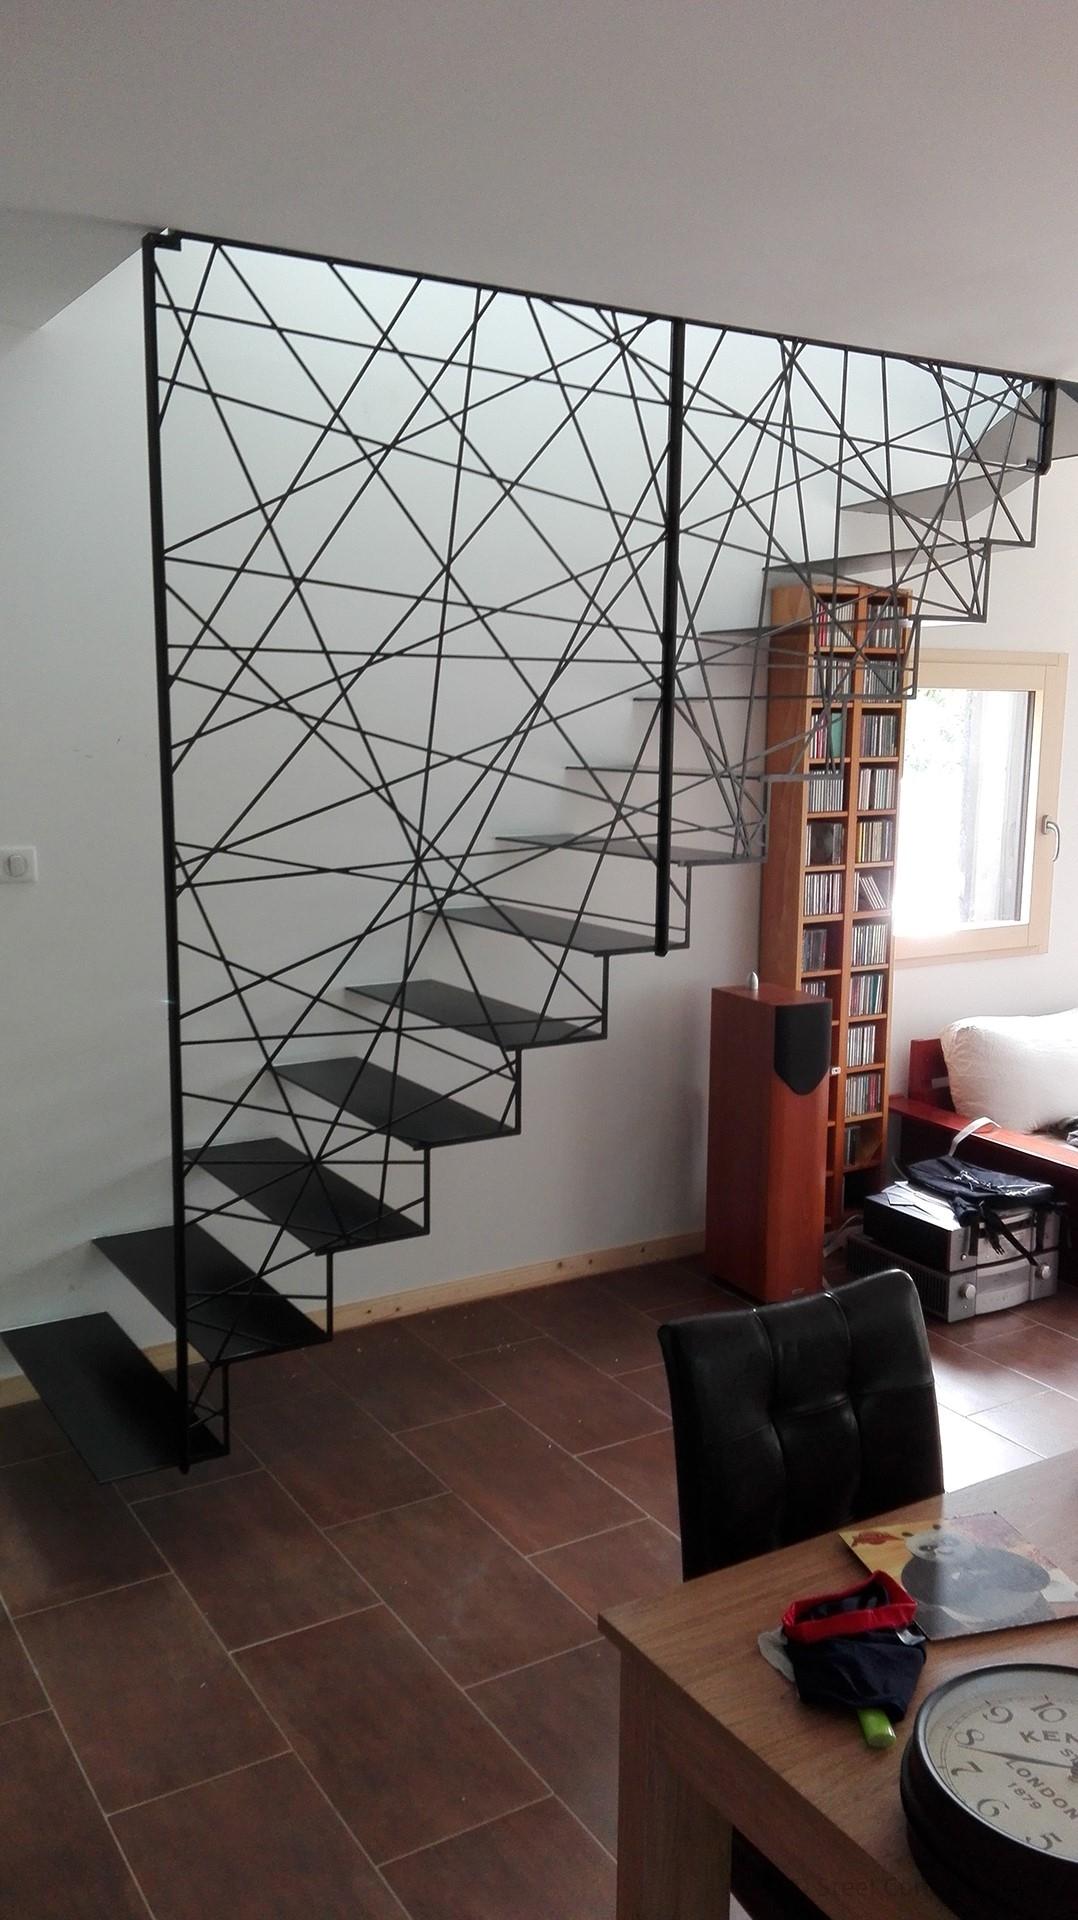 Escalier design suspendu, escalier metal design suspendu, escalier metal suspendu, Savenay, steel contemporain